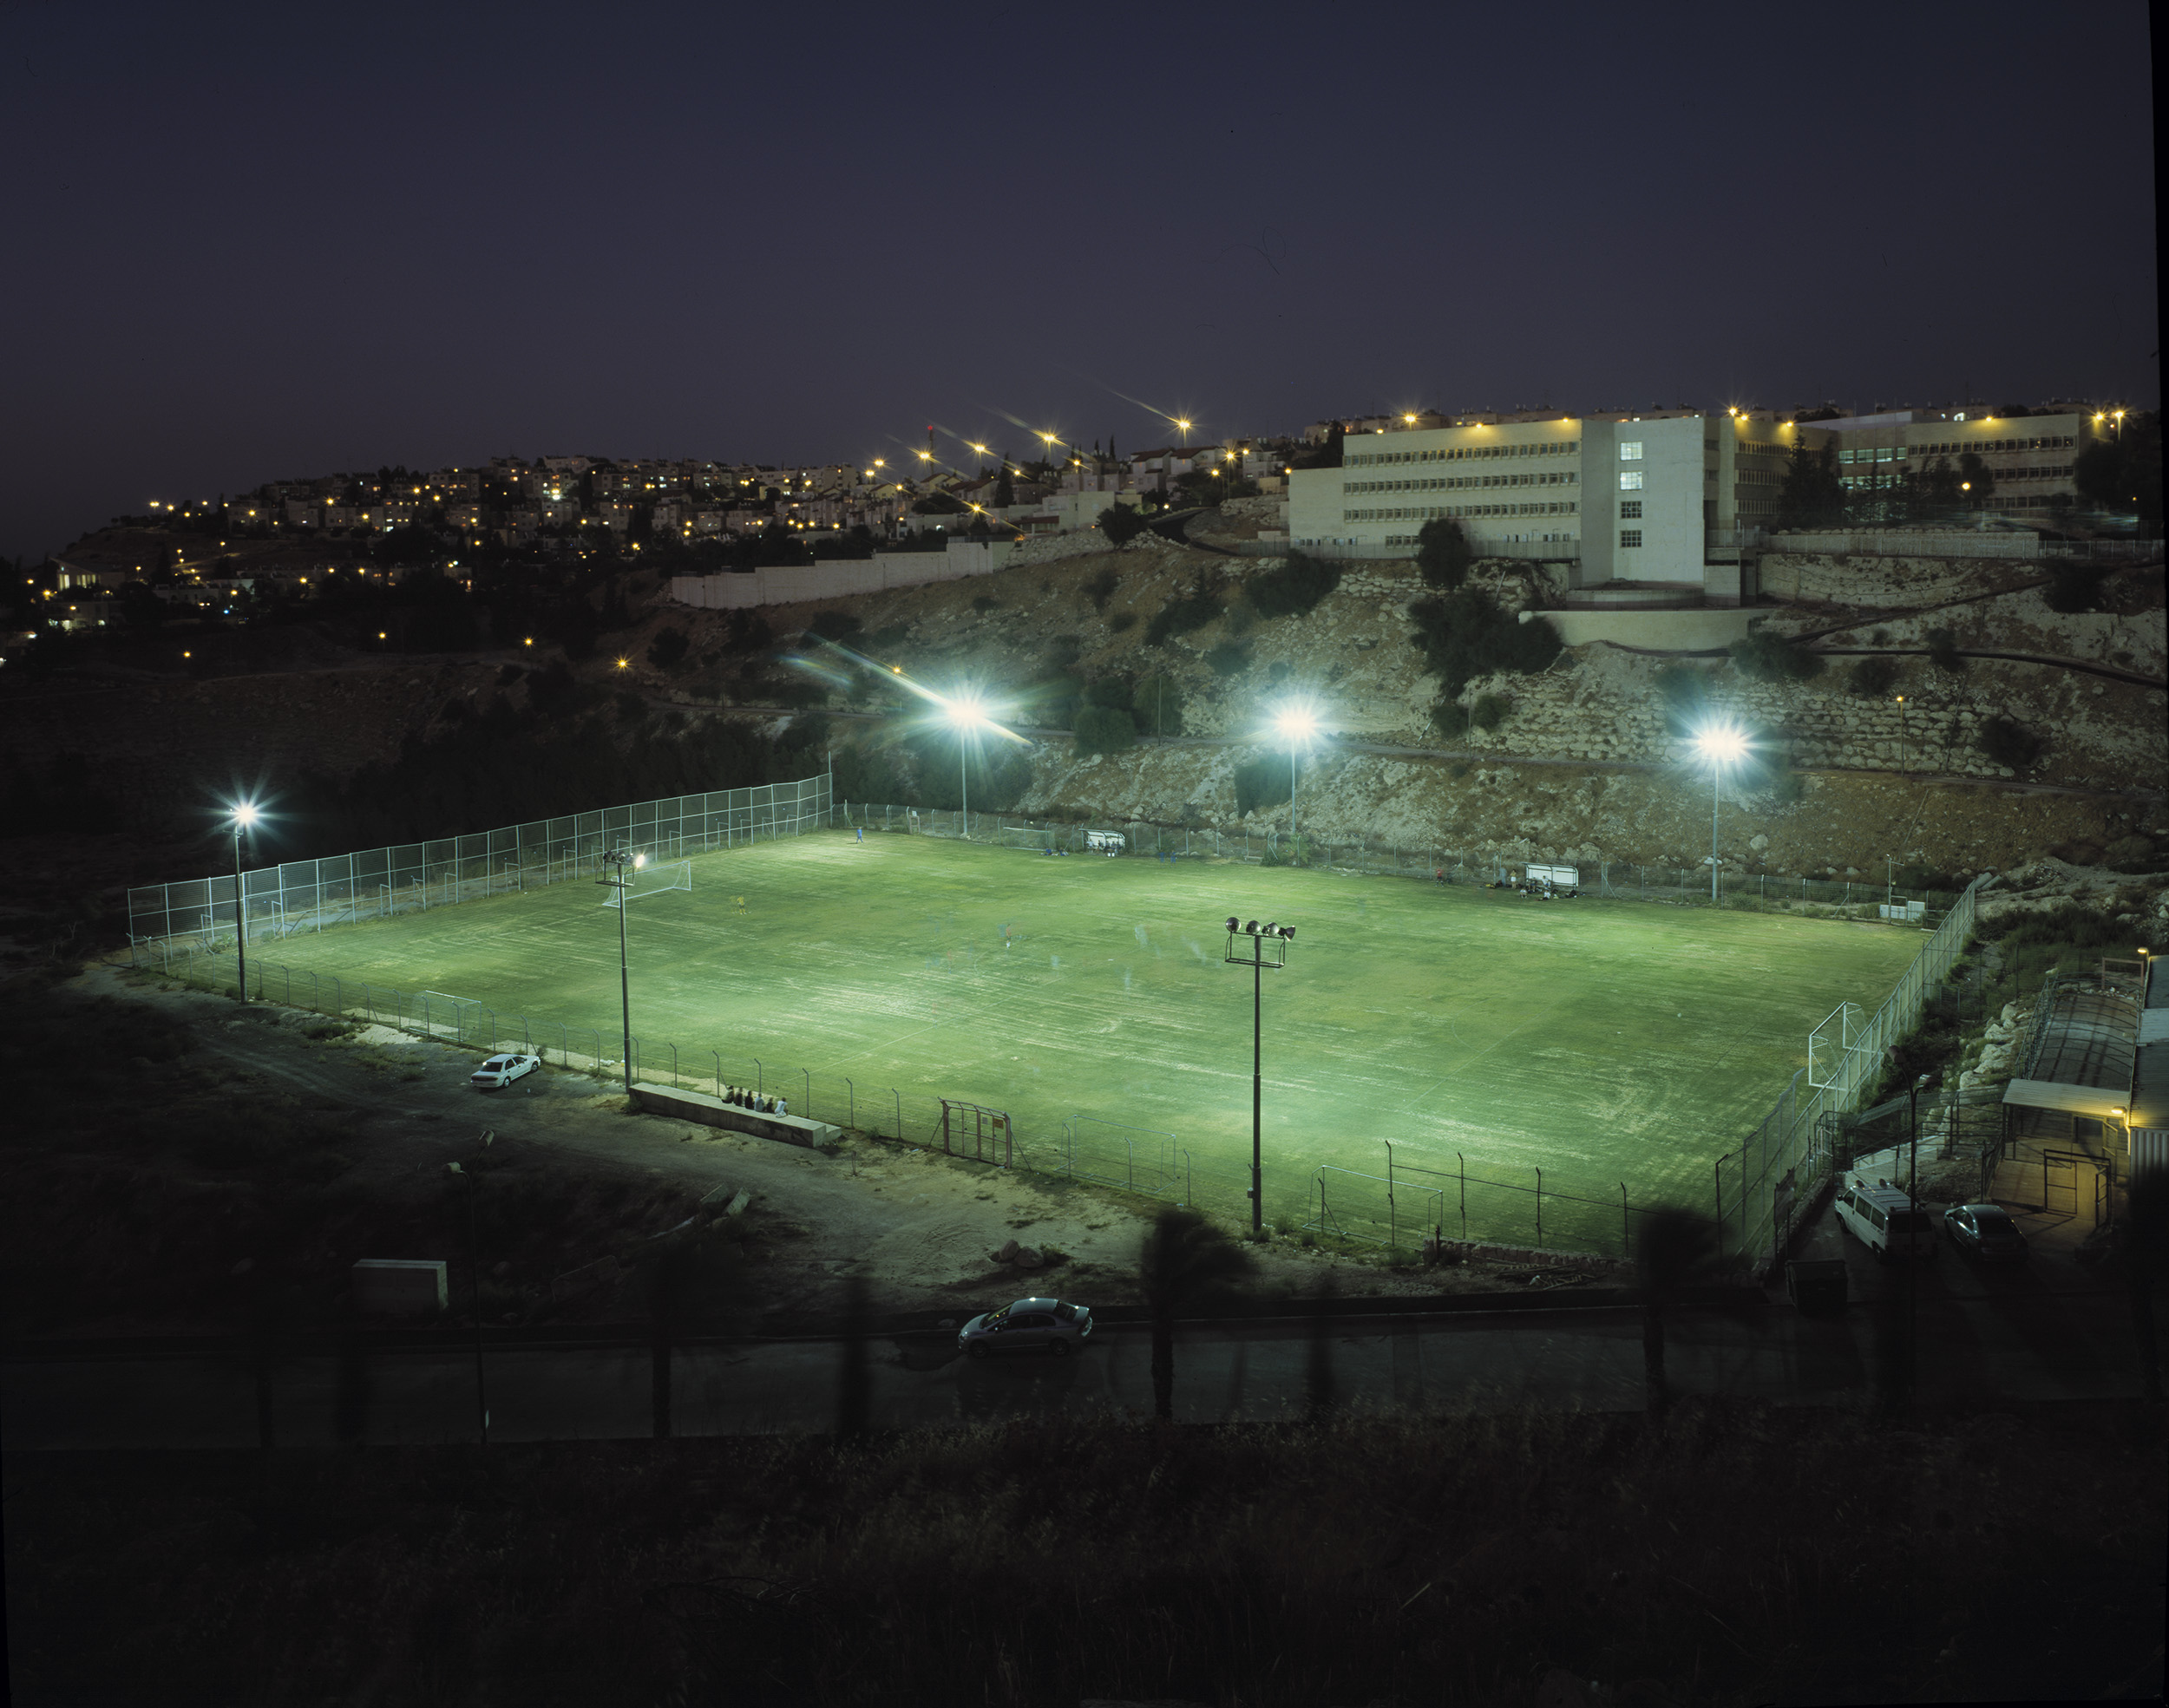 Picture 003 emty side field.jpg